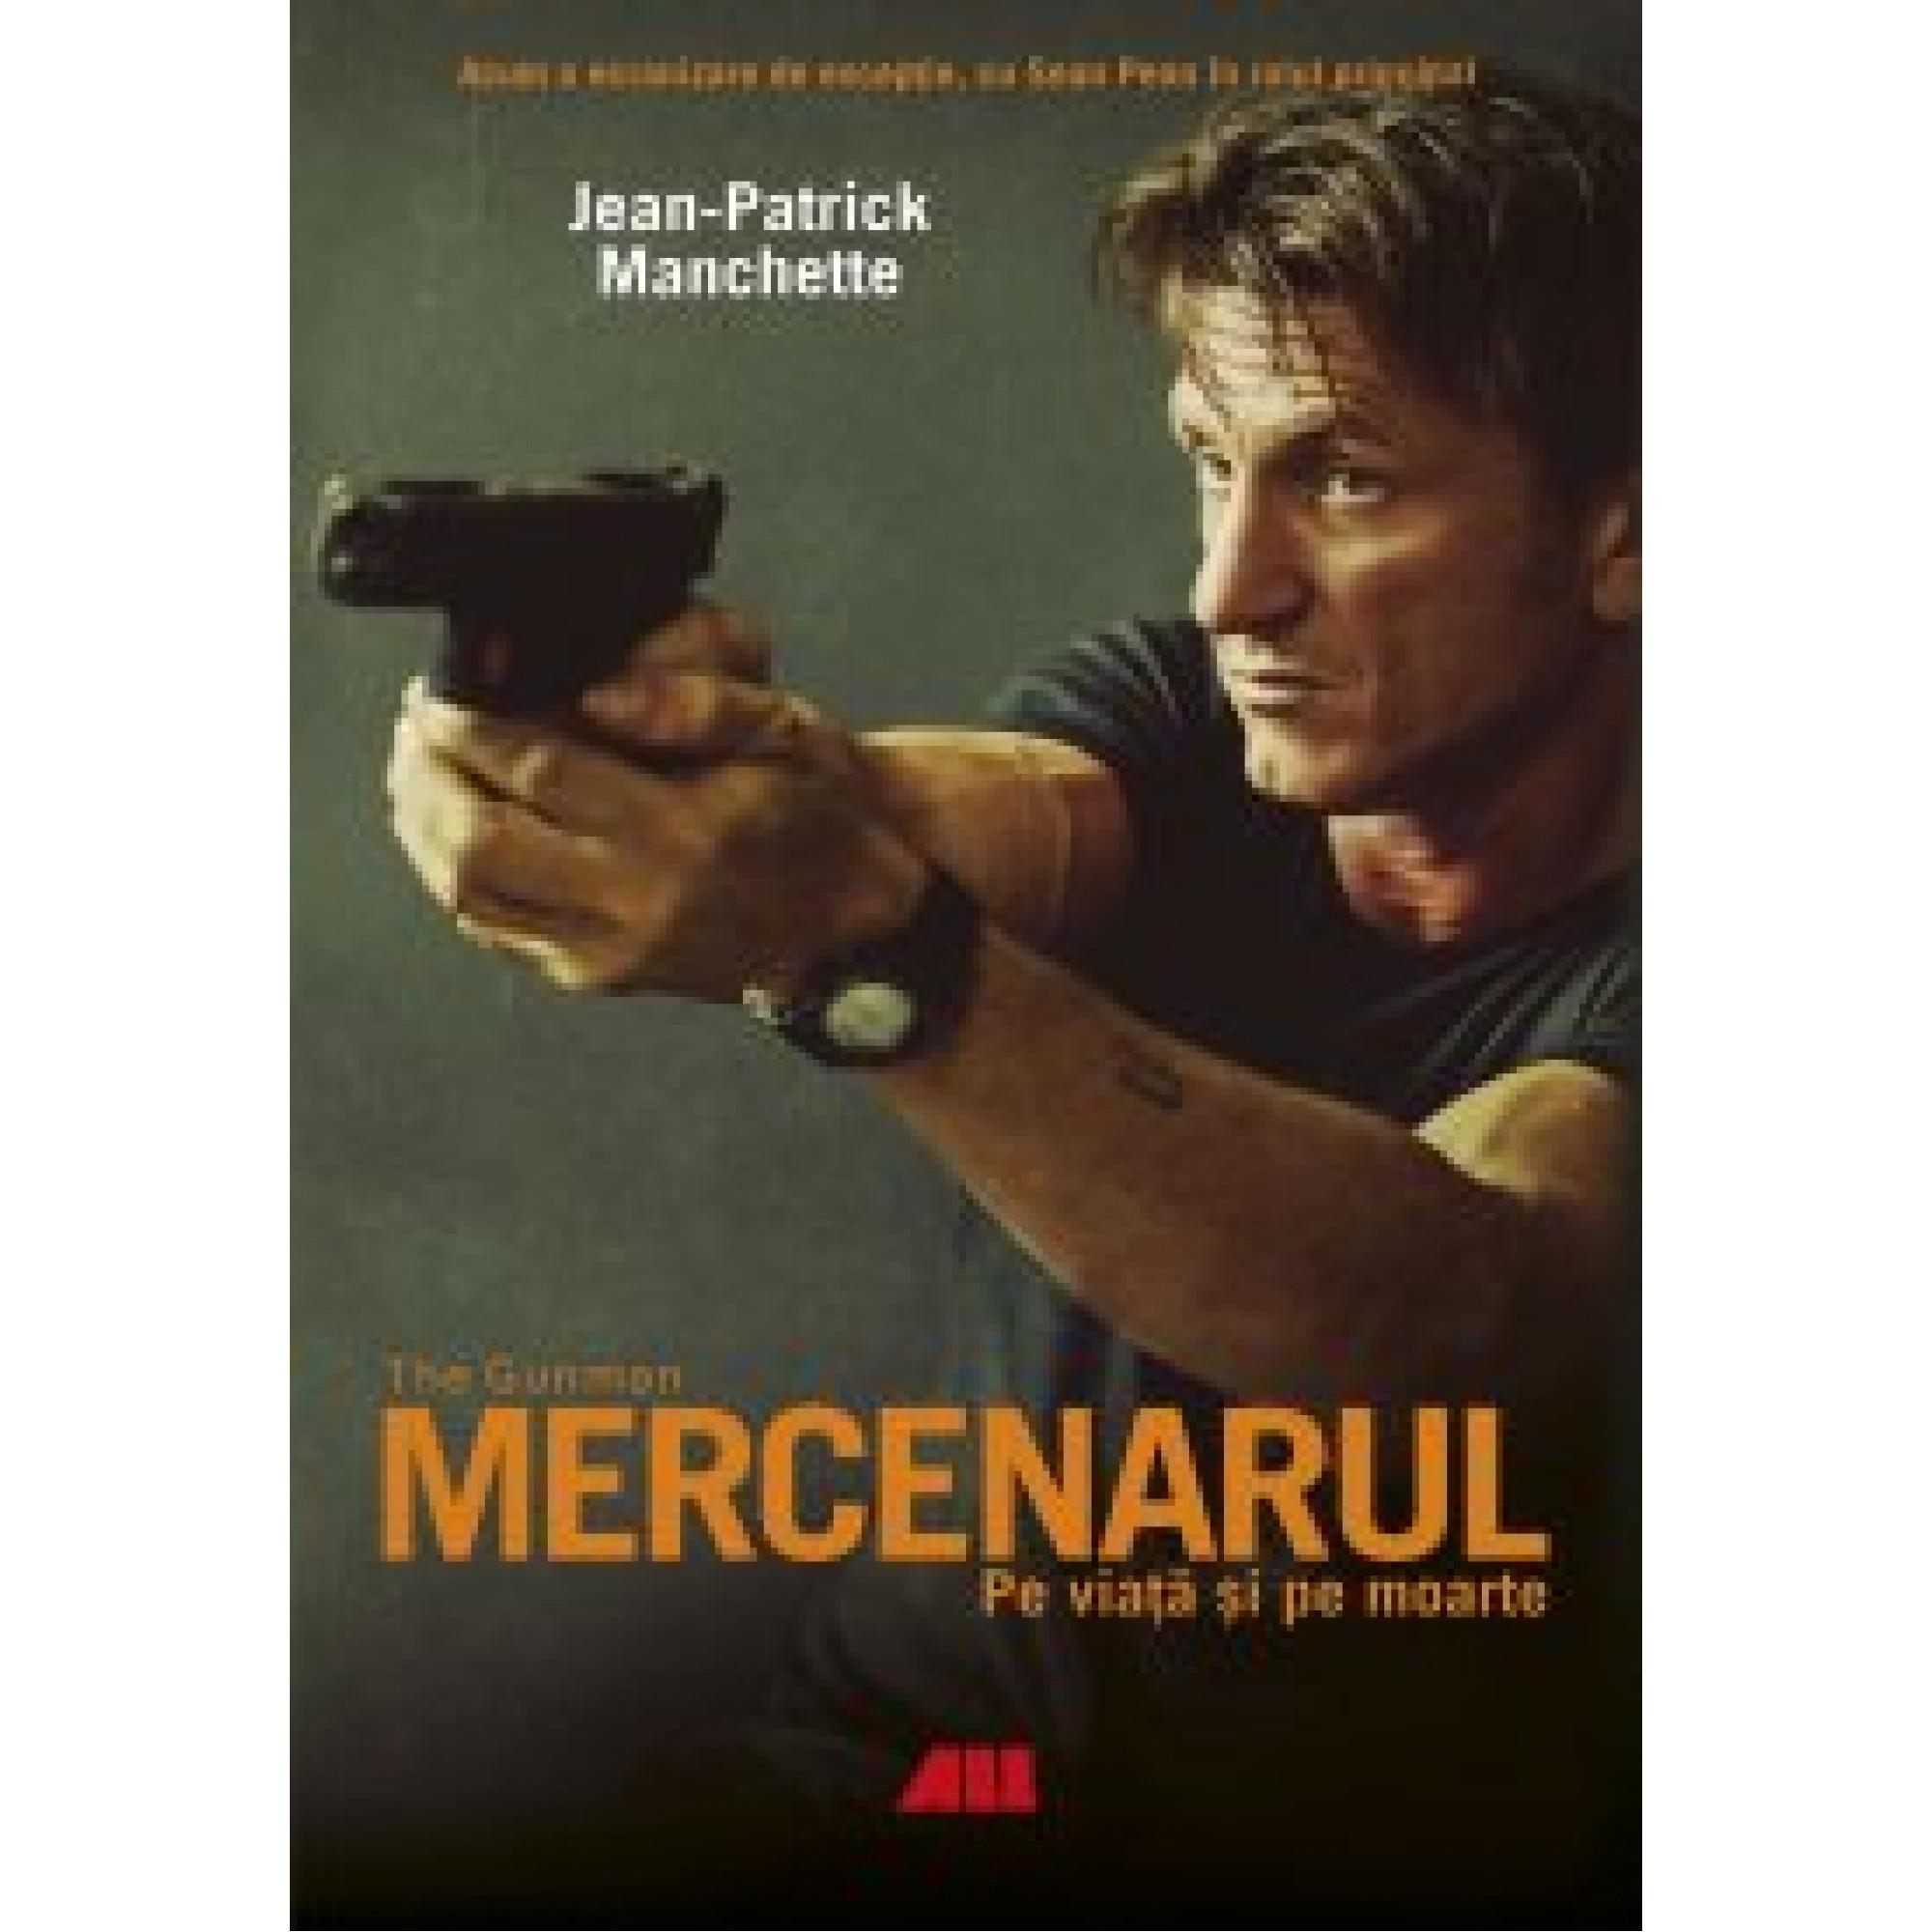 Mercenarul; Jean-Patrick Manchette